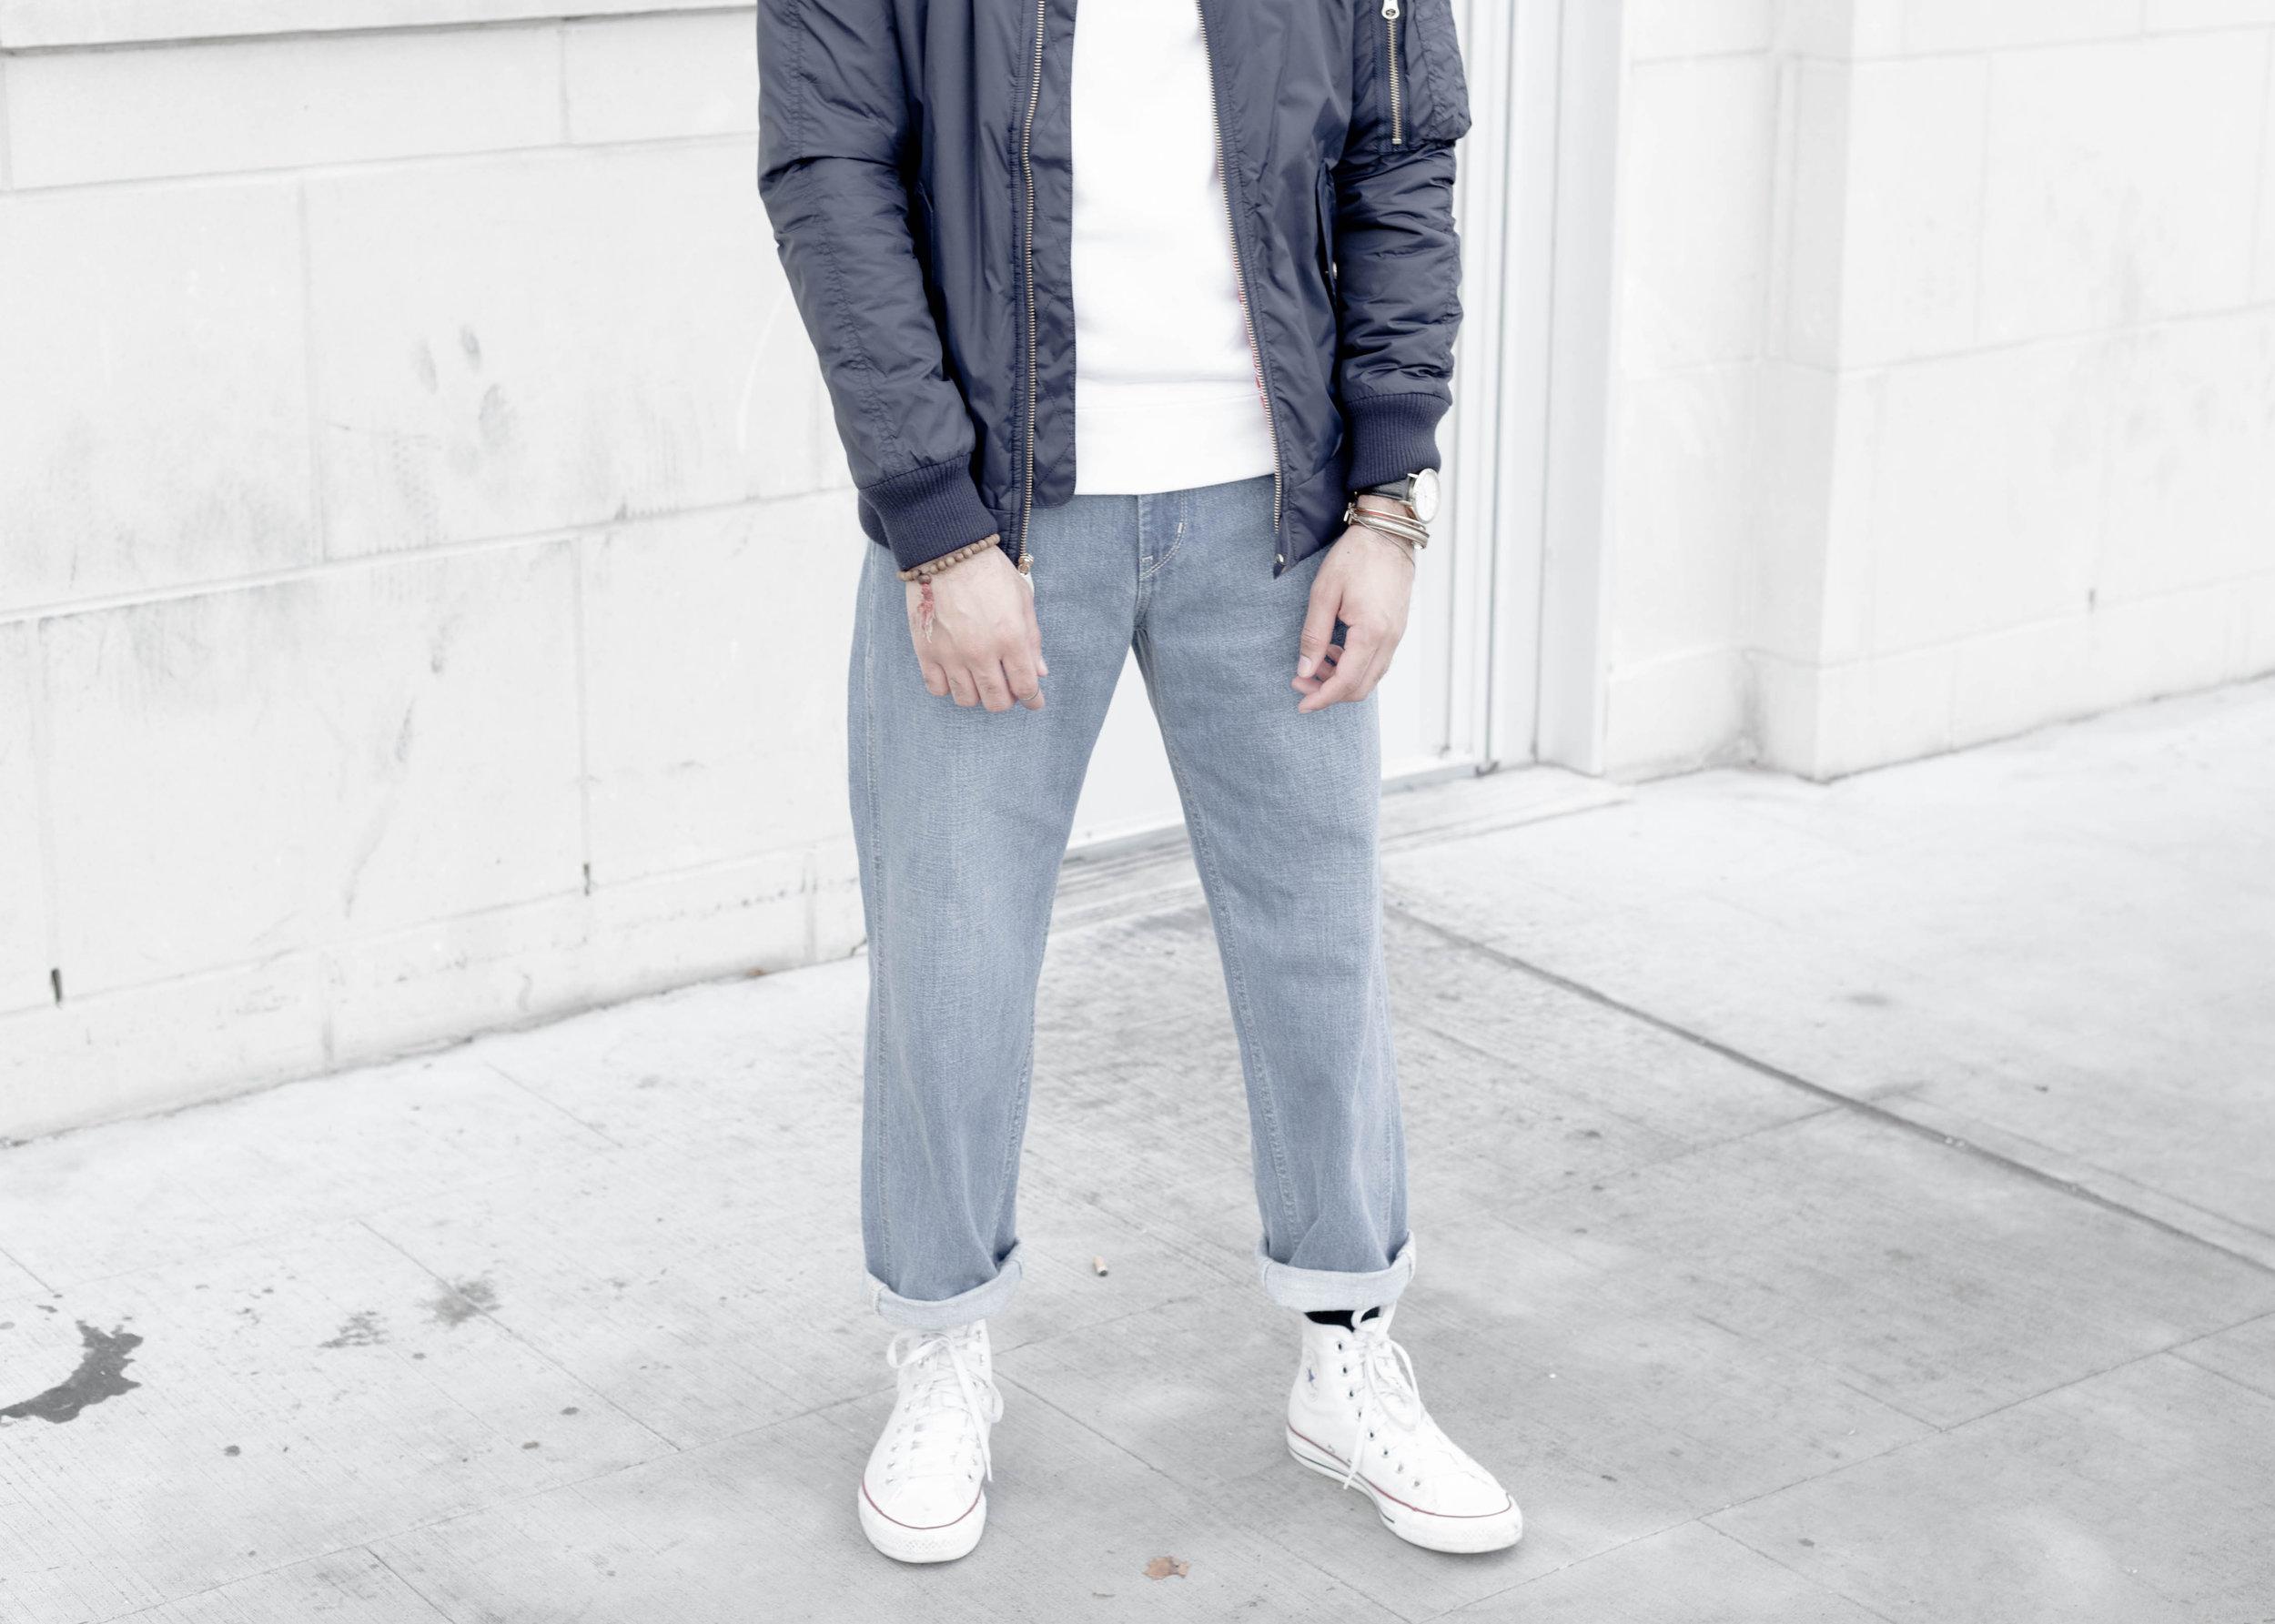 sam-c-perry-short-sleeve-sweatshirt-oversized-relaxed-denim-denim-uniqlo-u-bottom.jpg